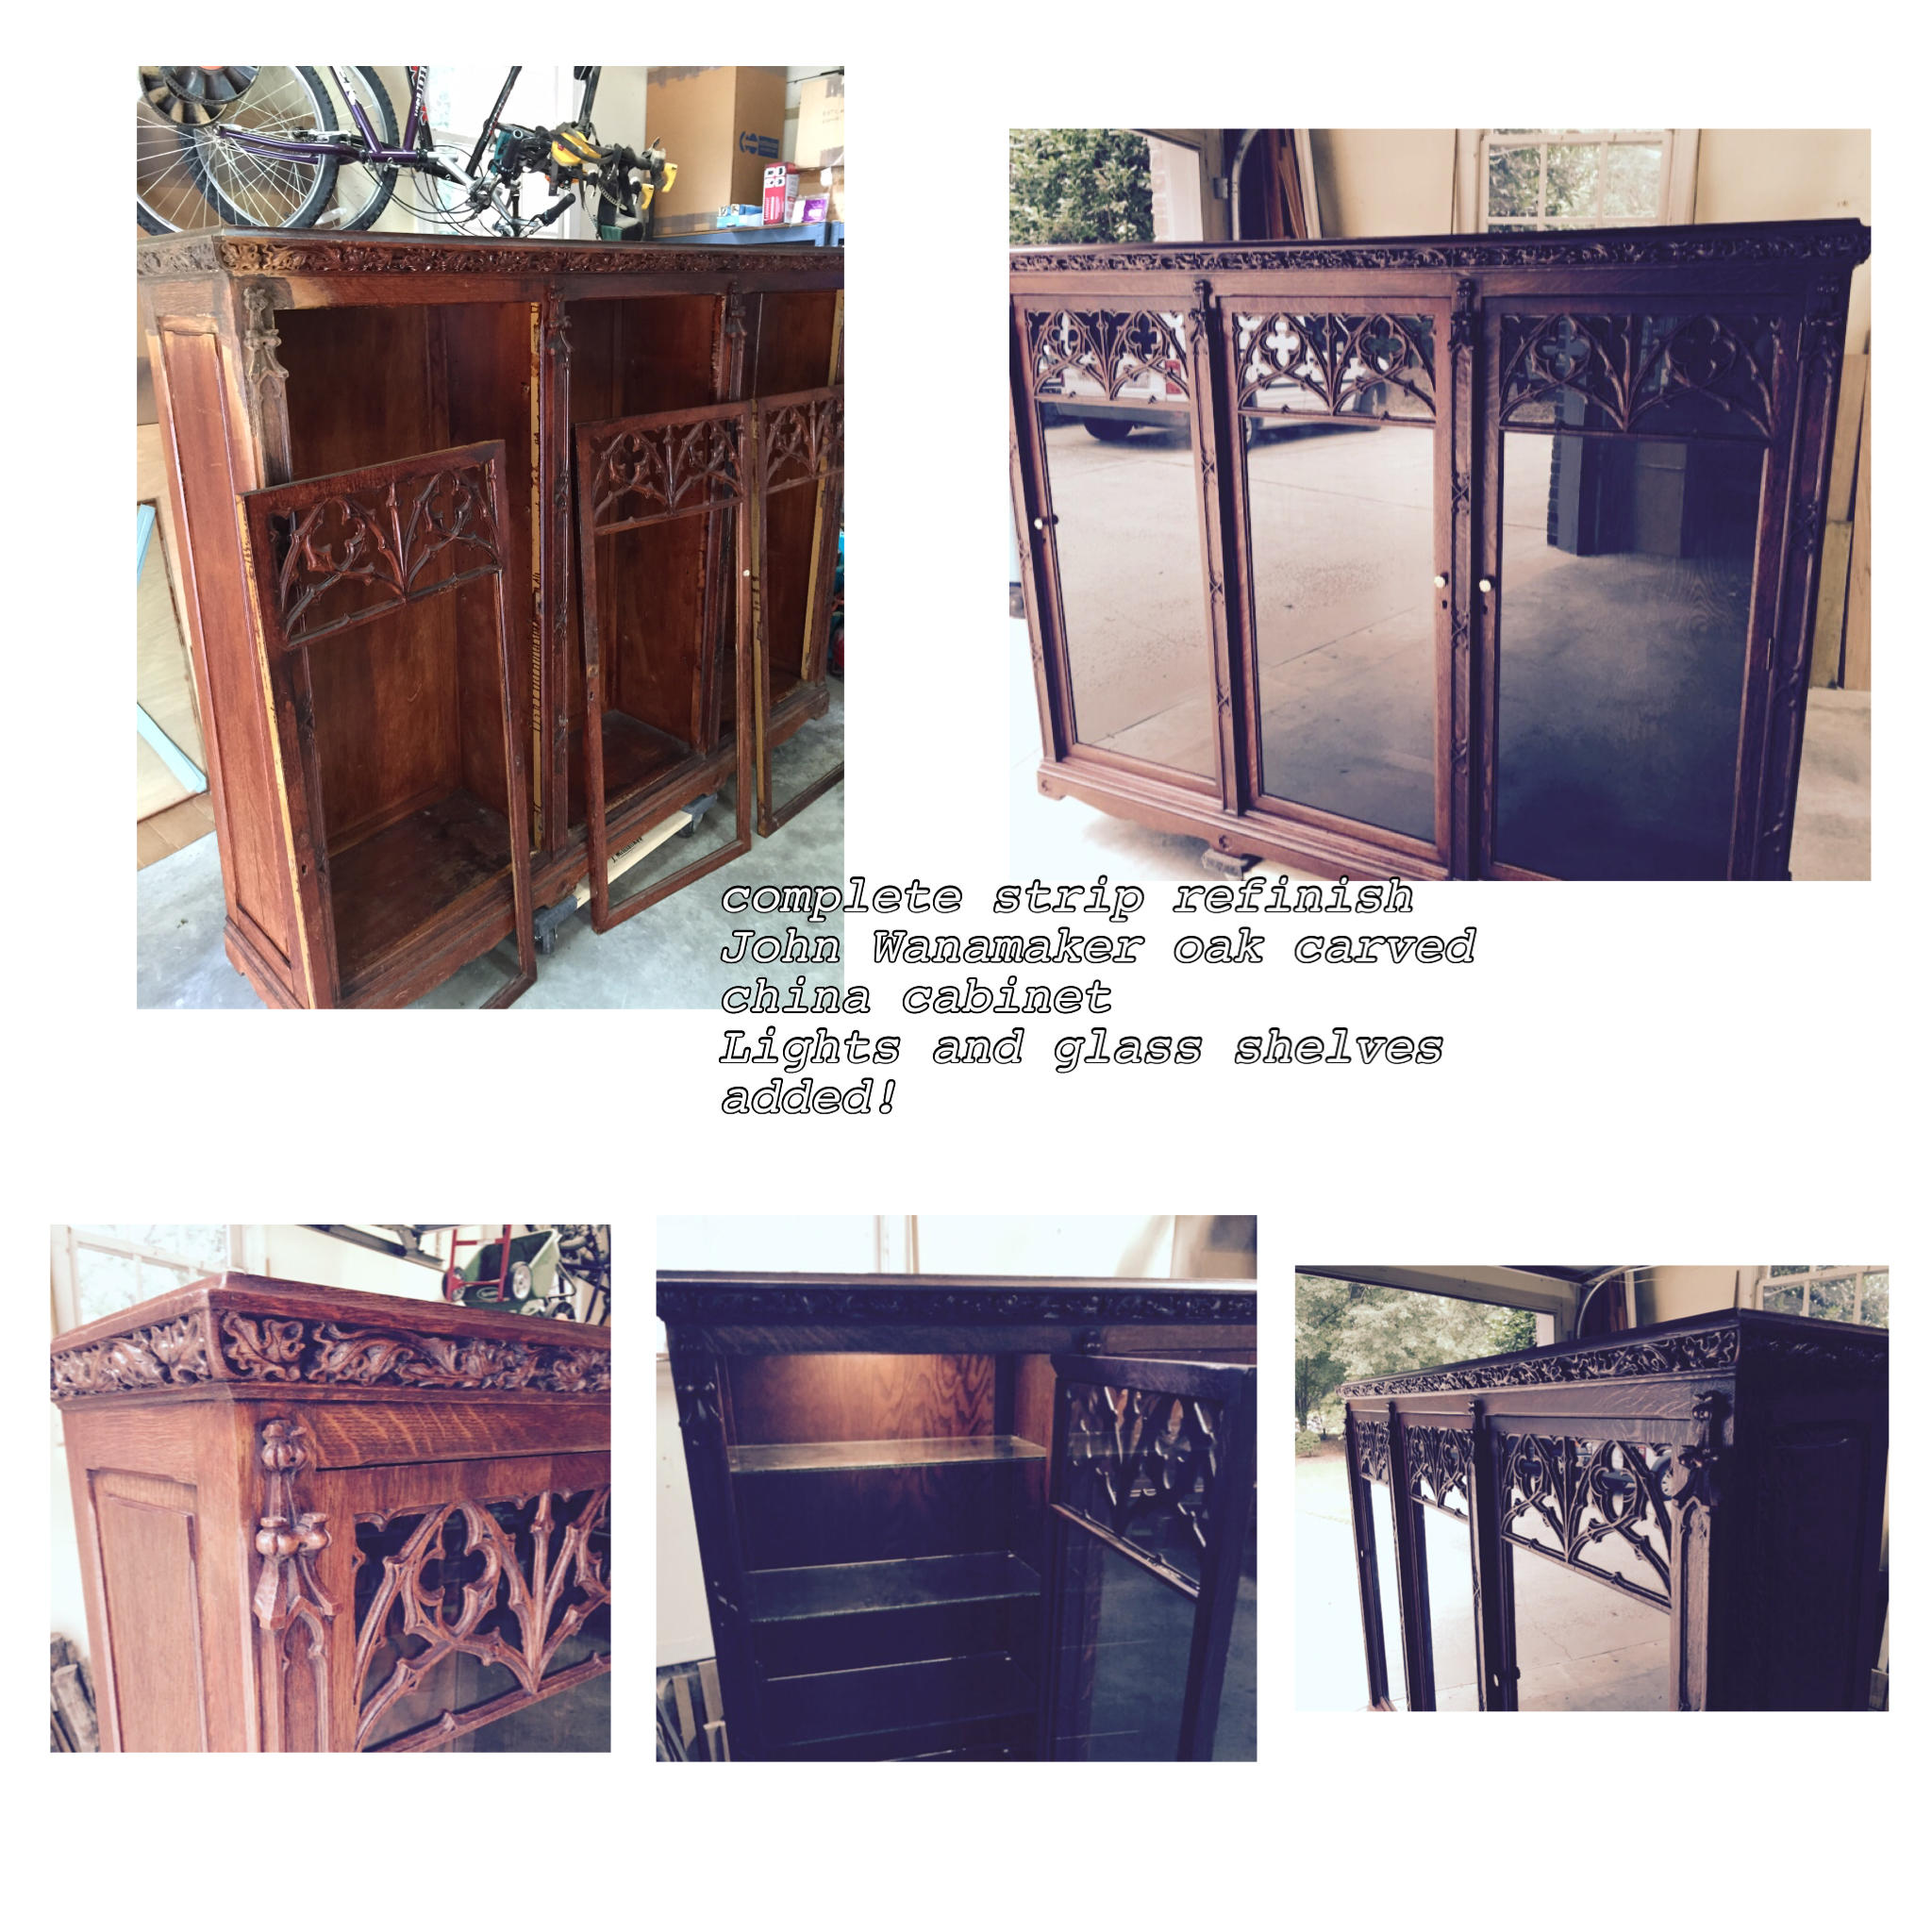 Furniture Medic By Michael Fuglestad In Goldsboro Nc 919 920 4